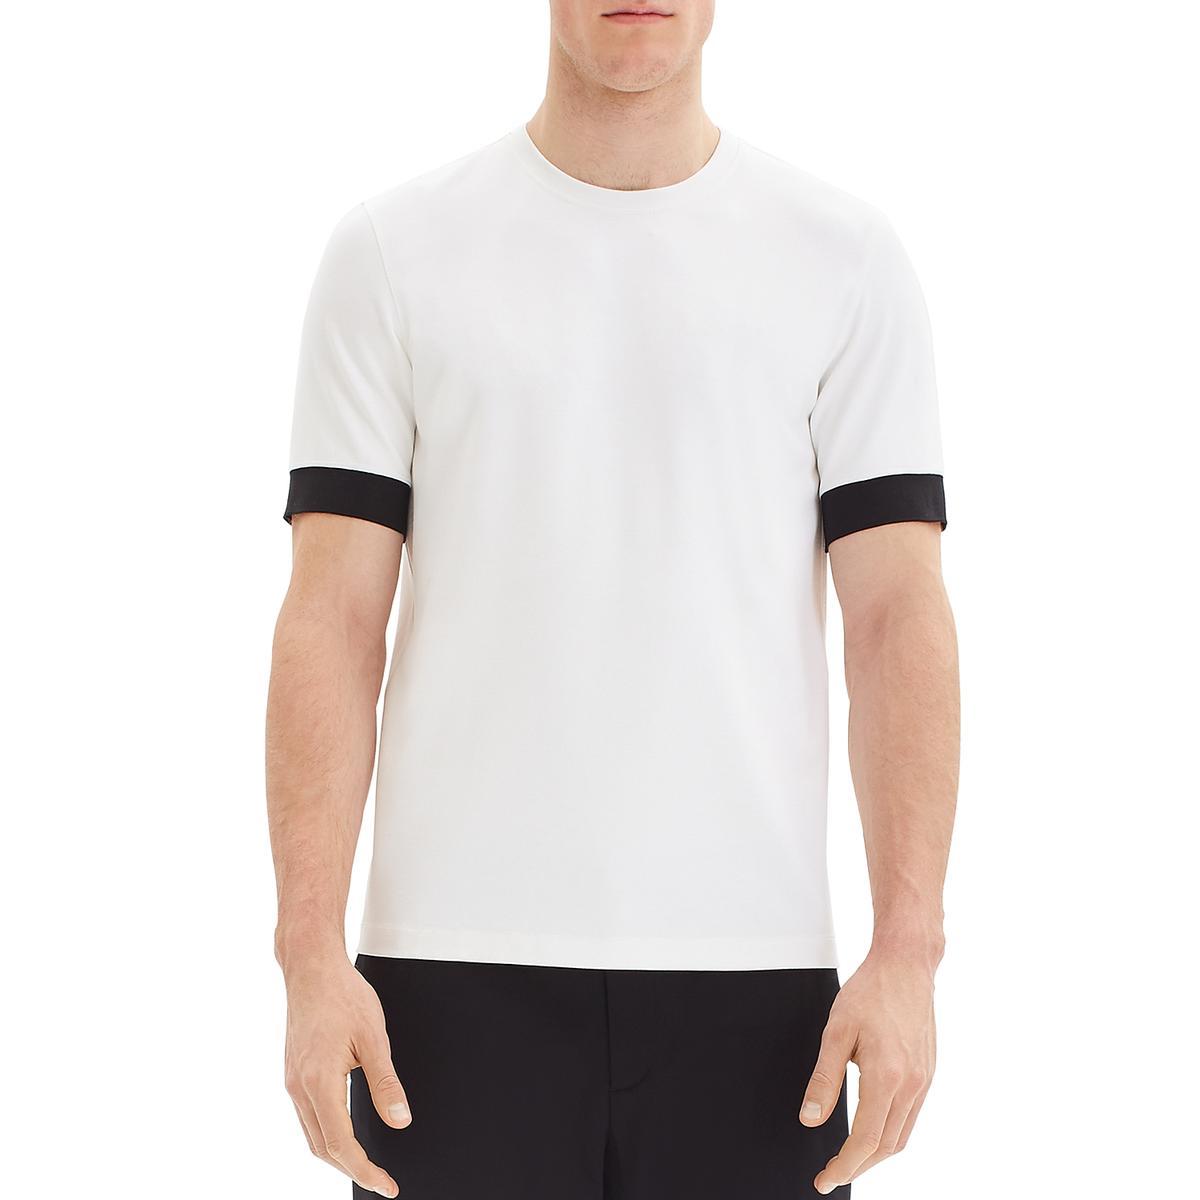 Theory Mens Ivory Layered Crewneck Tee T-Shirt L BHFO 7654